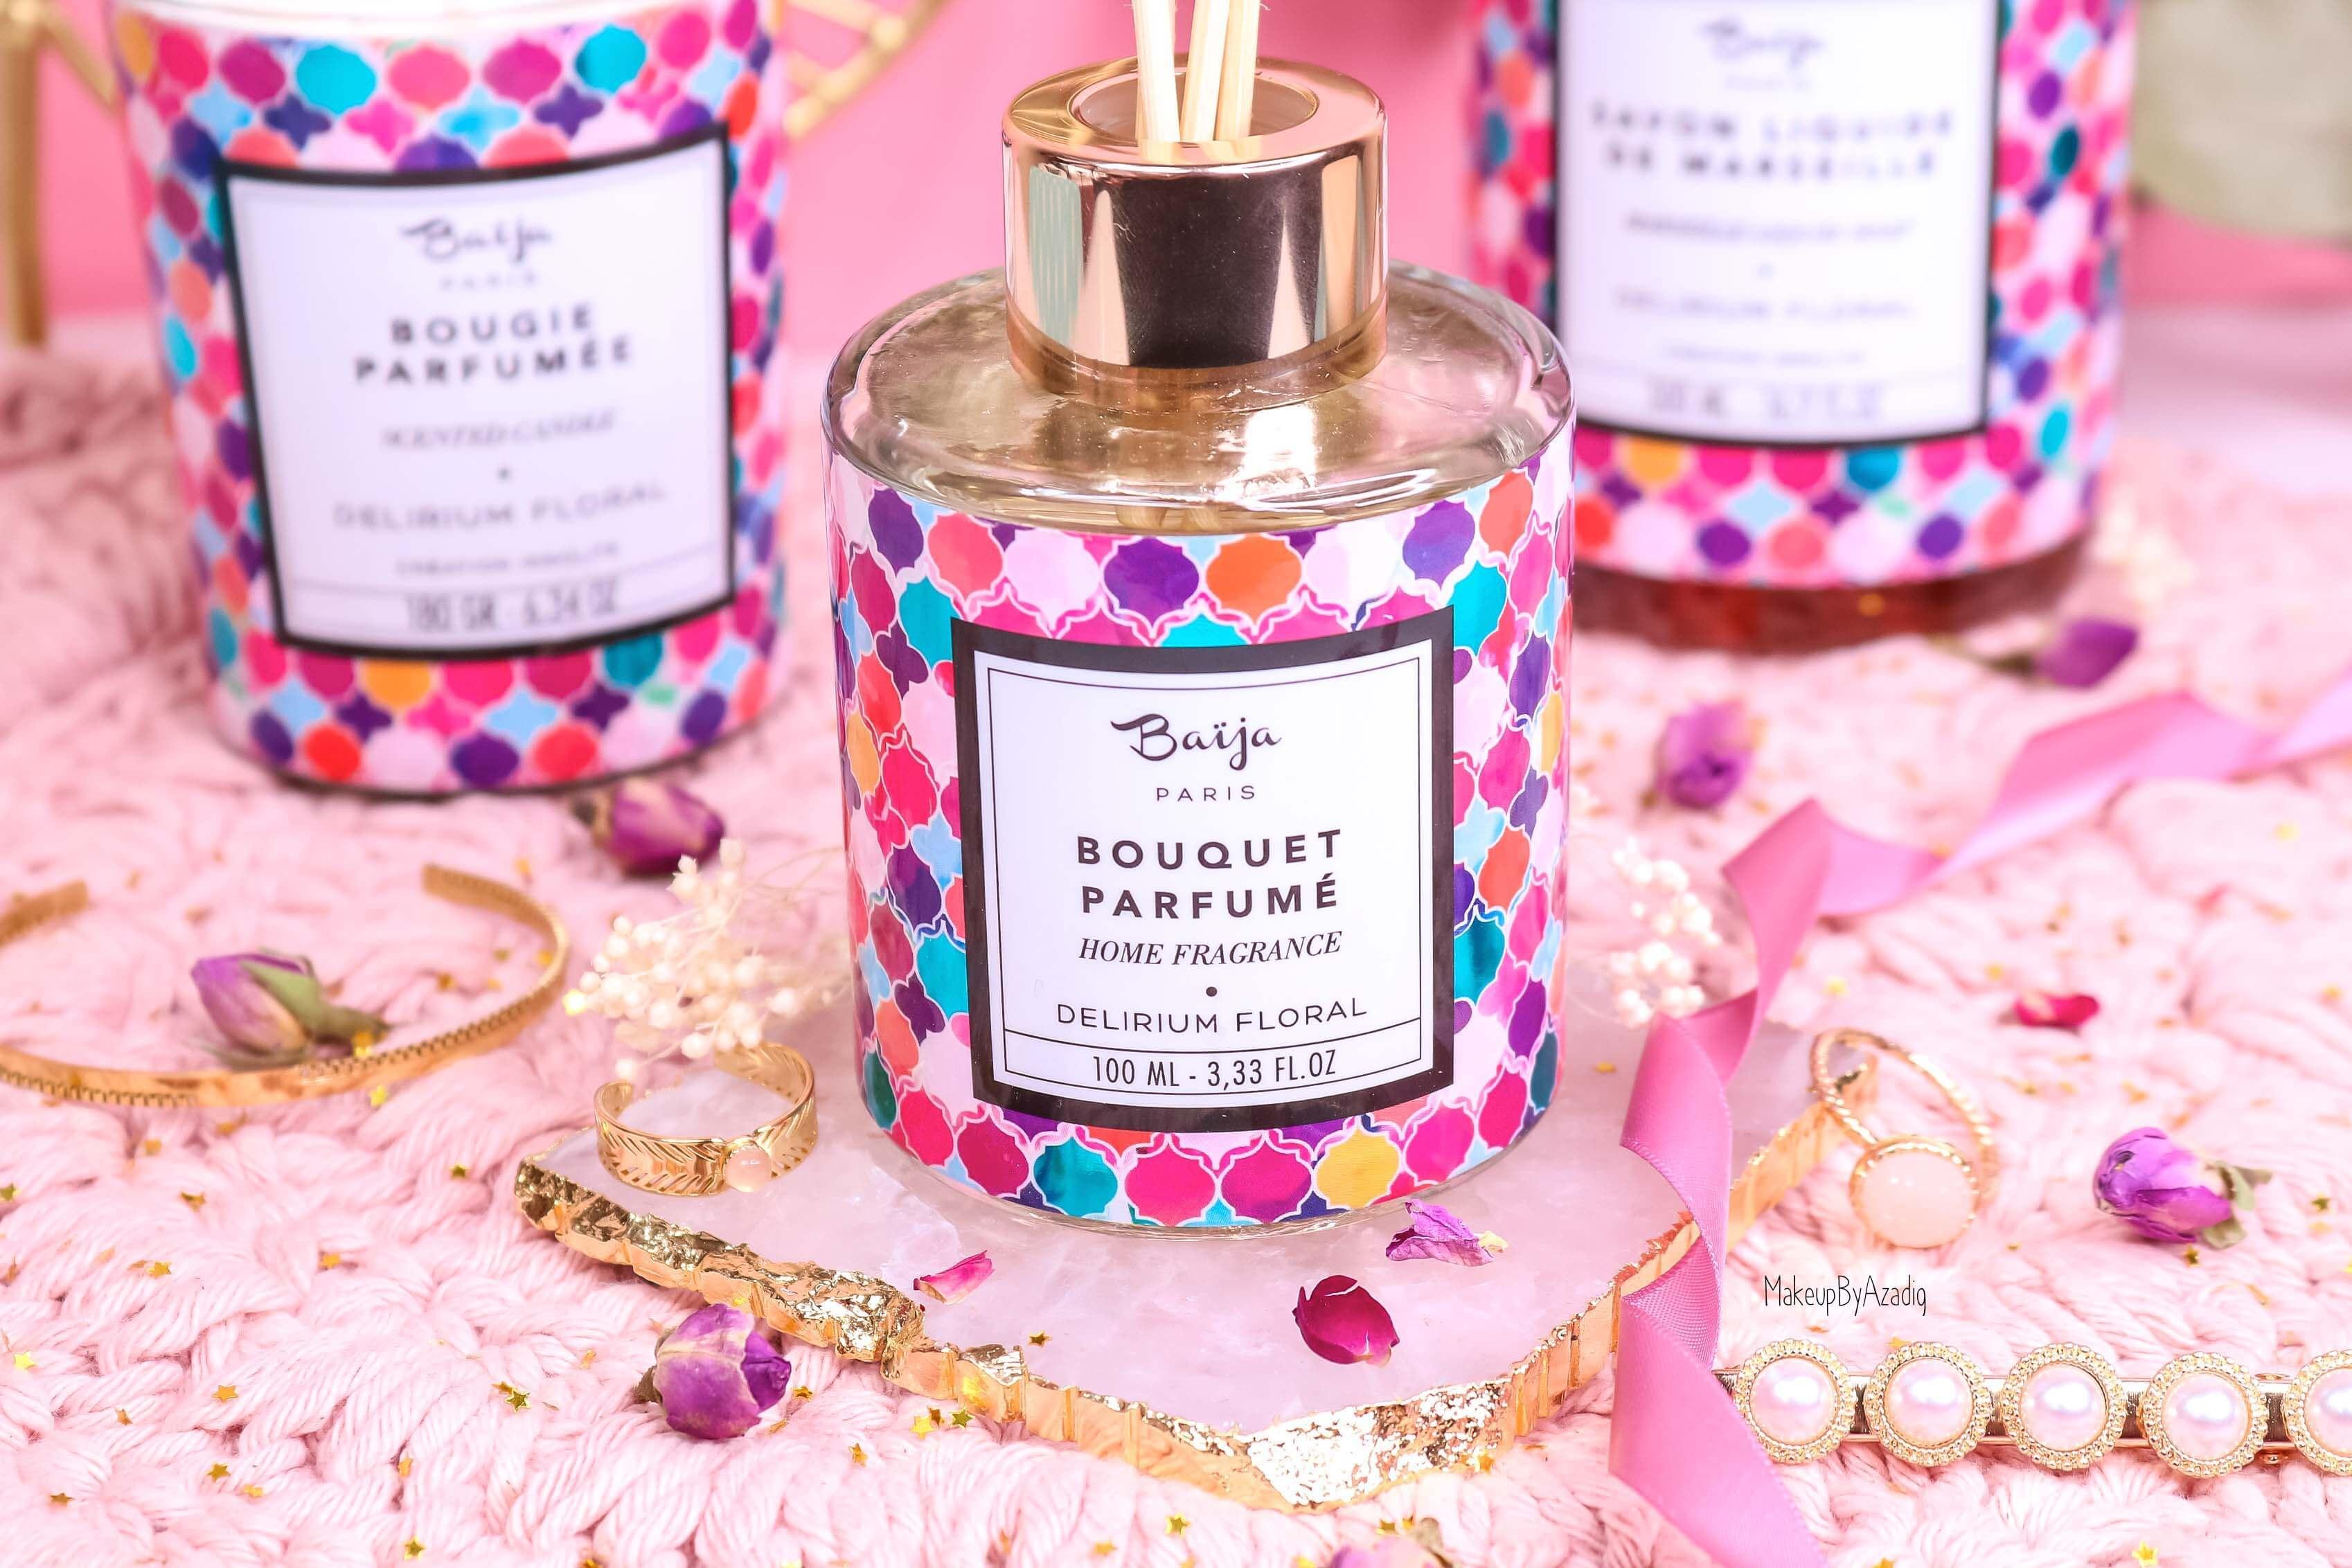 revue-collection-delirium-floral-baija-paris-corps-bougie-gommage-soin-fleurs-makeupbyazadig-avis-prix-sephora-home